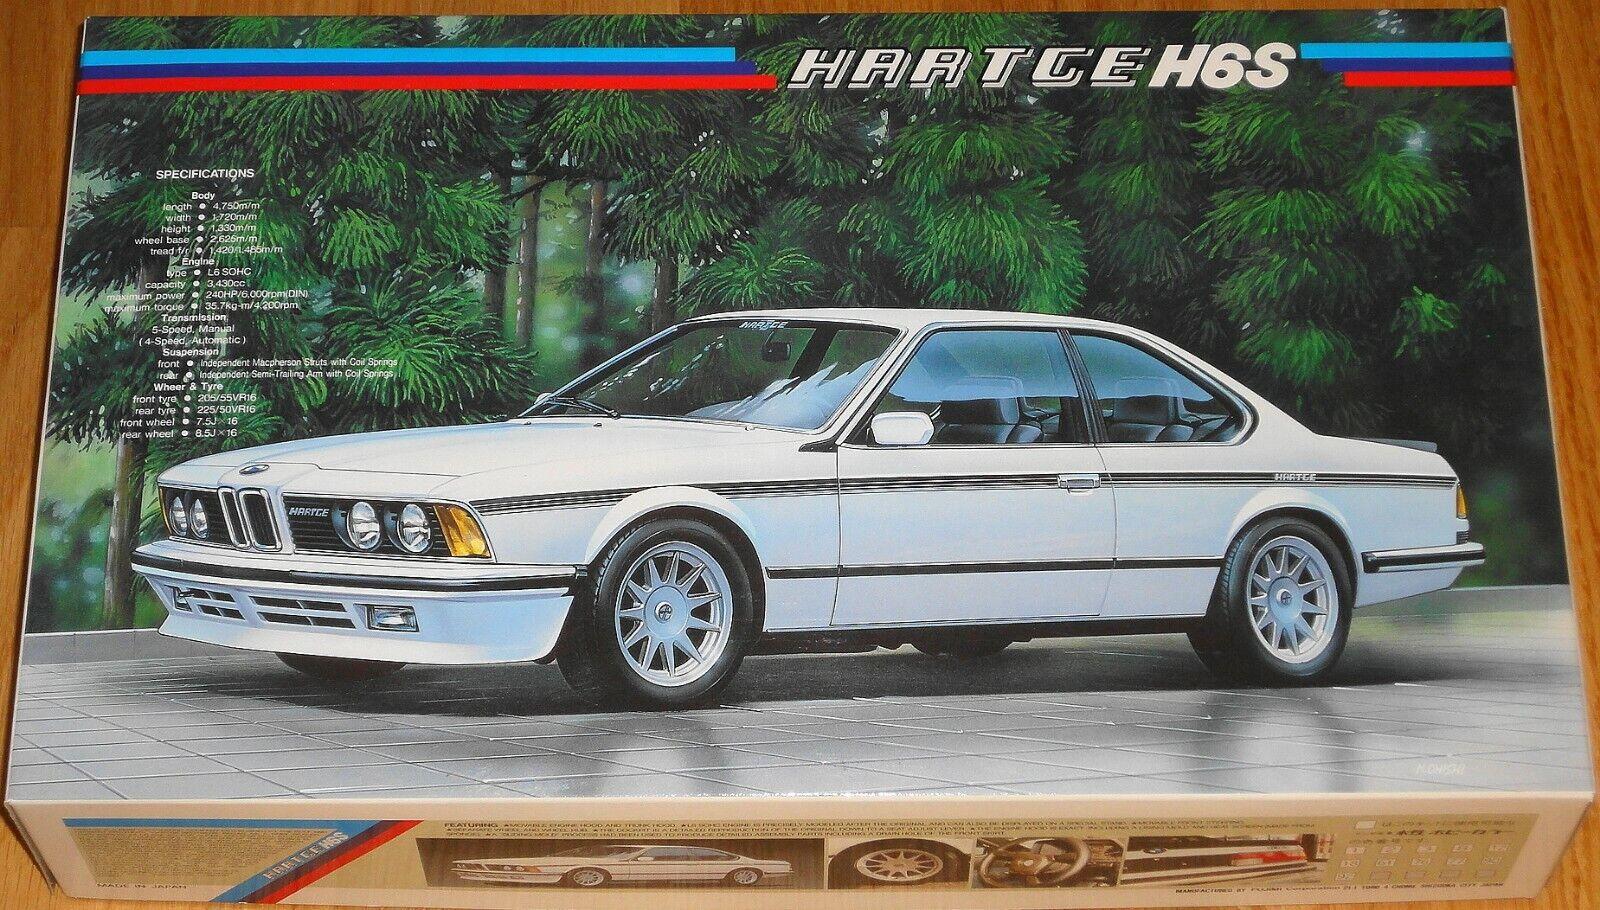 FUJIMI ENTHUSIAST MODEL BMW HARTGE H6S 1 24